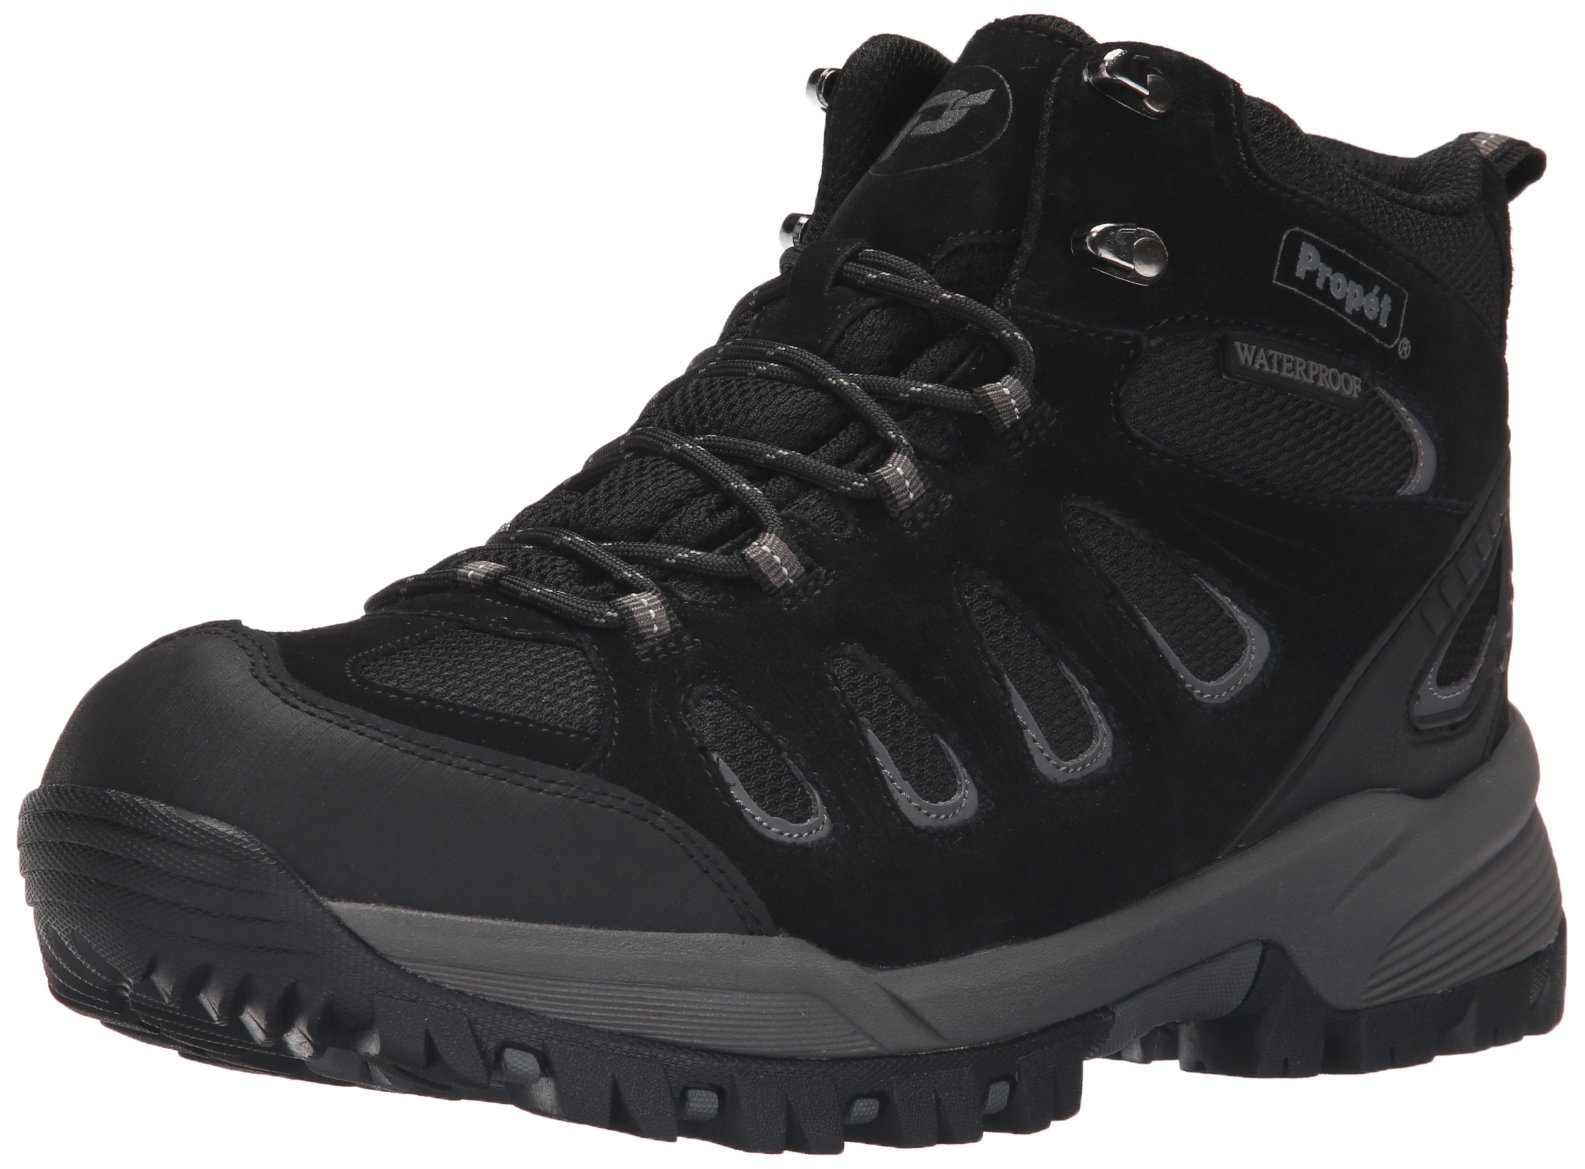 Propet Men's Ridge Walker Winter Boot, Black, 9.5 3E US